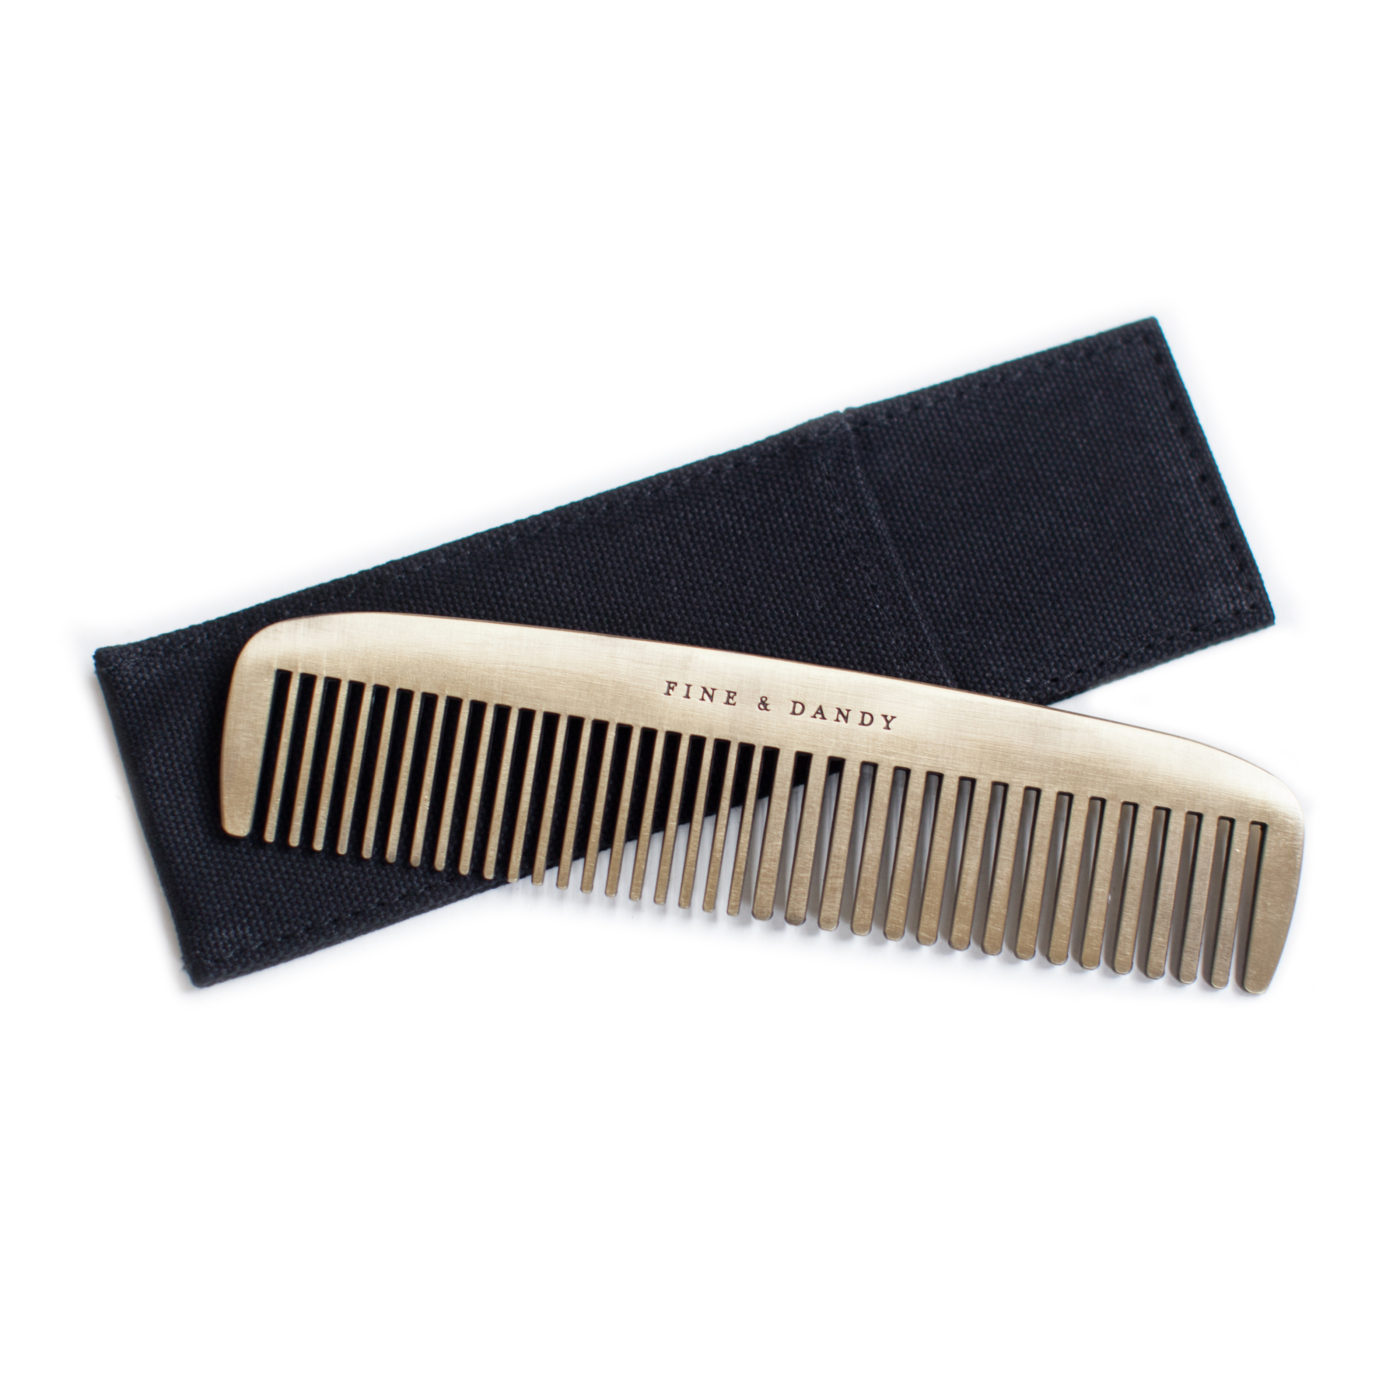 brass comb fine & dandy from izola gift for men